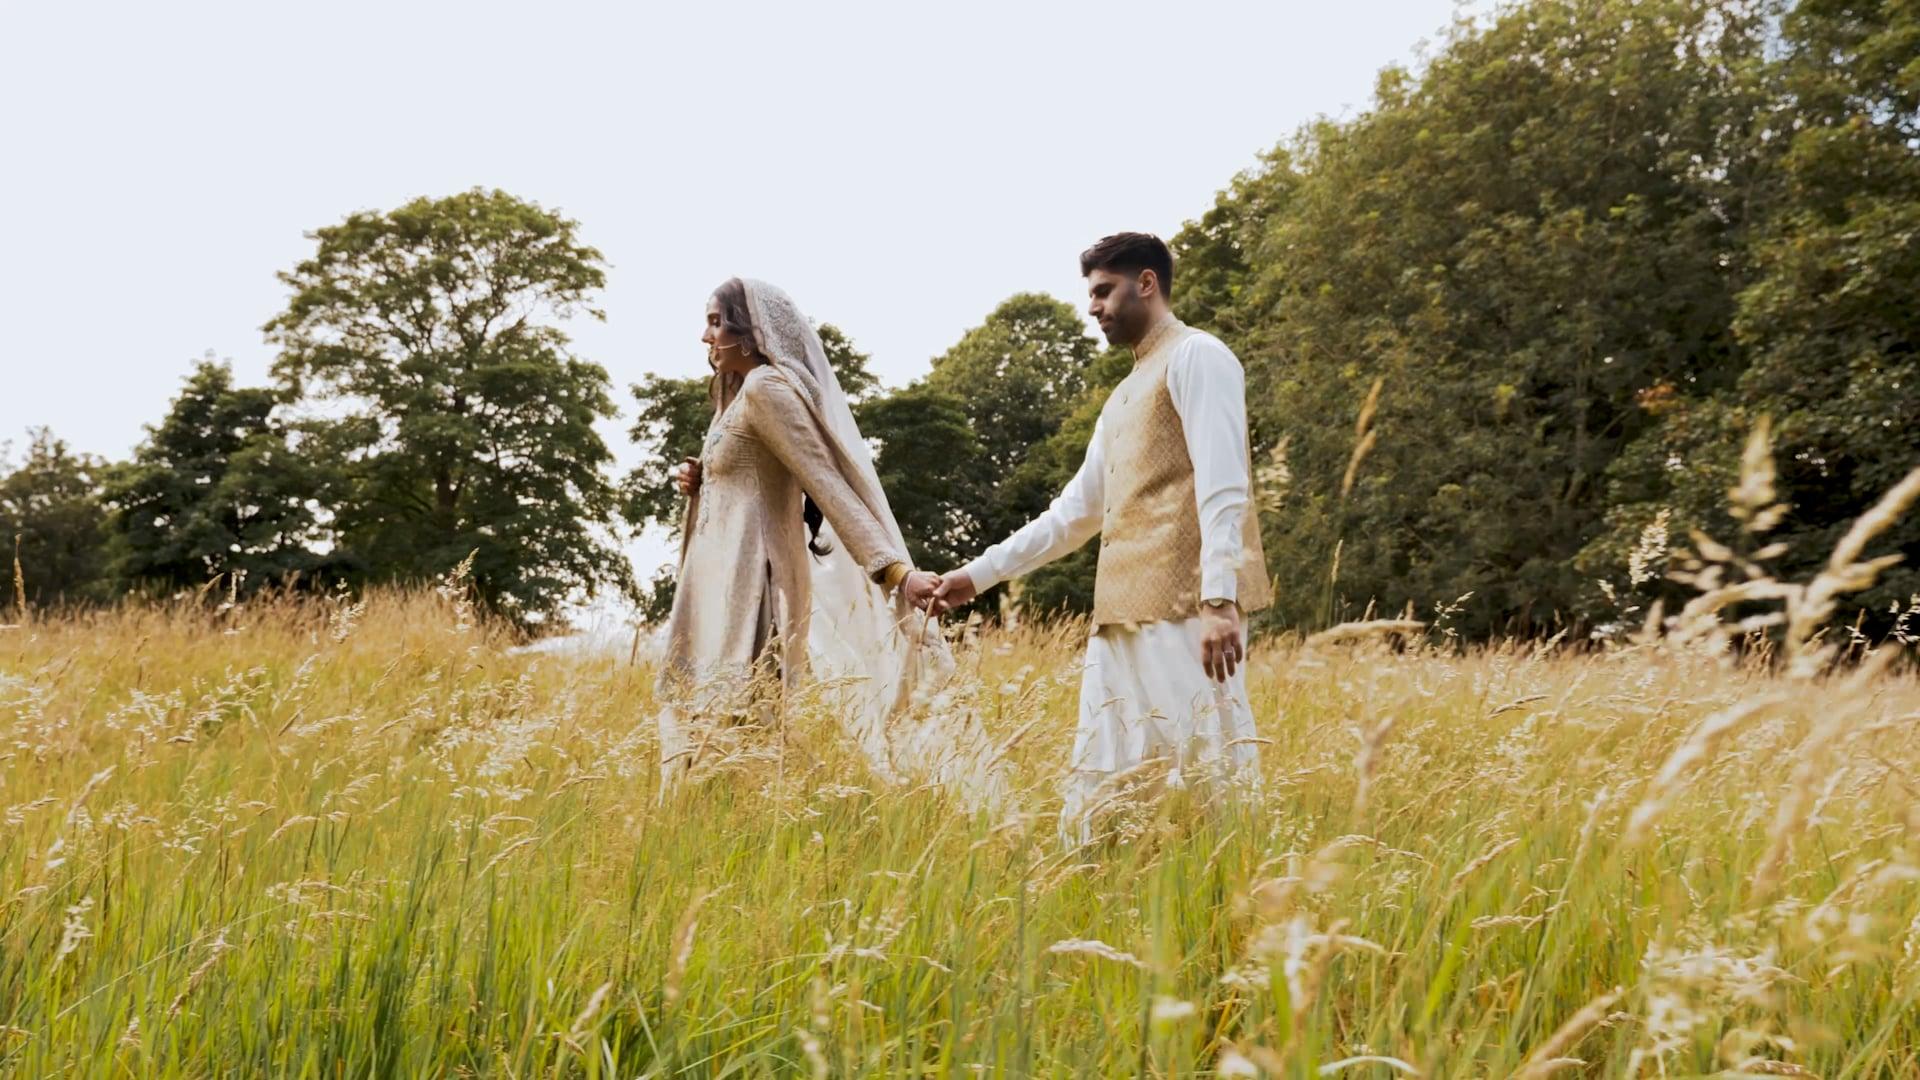 Fatima & Ahmer | Intimate Nikkah Ceremony